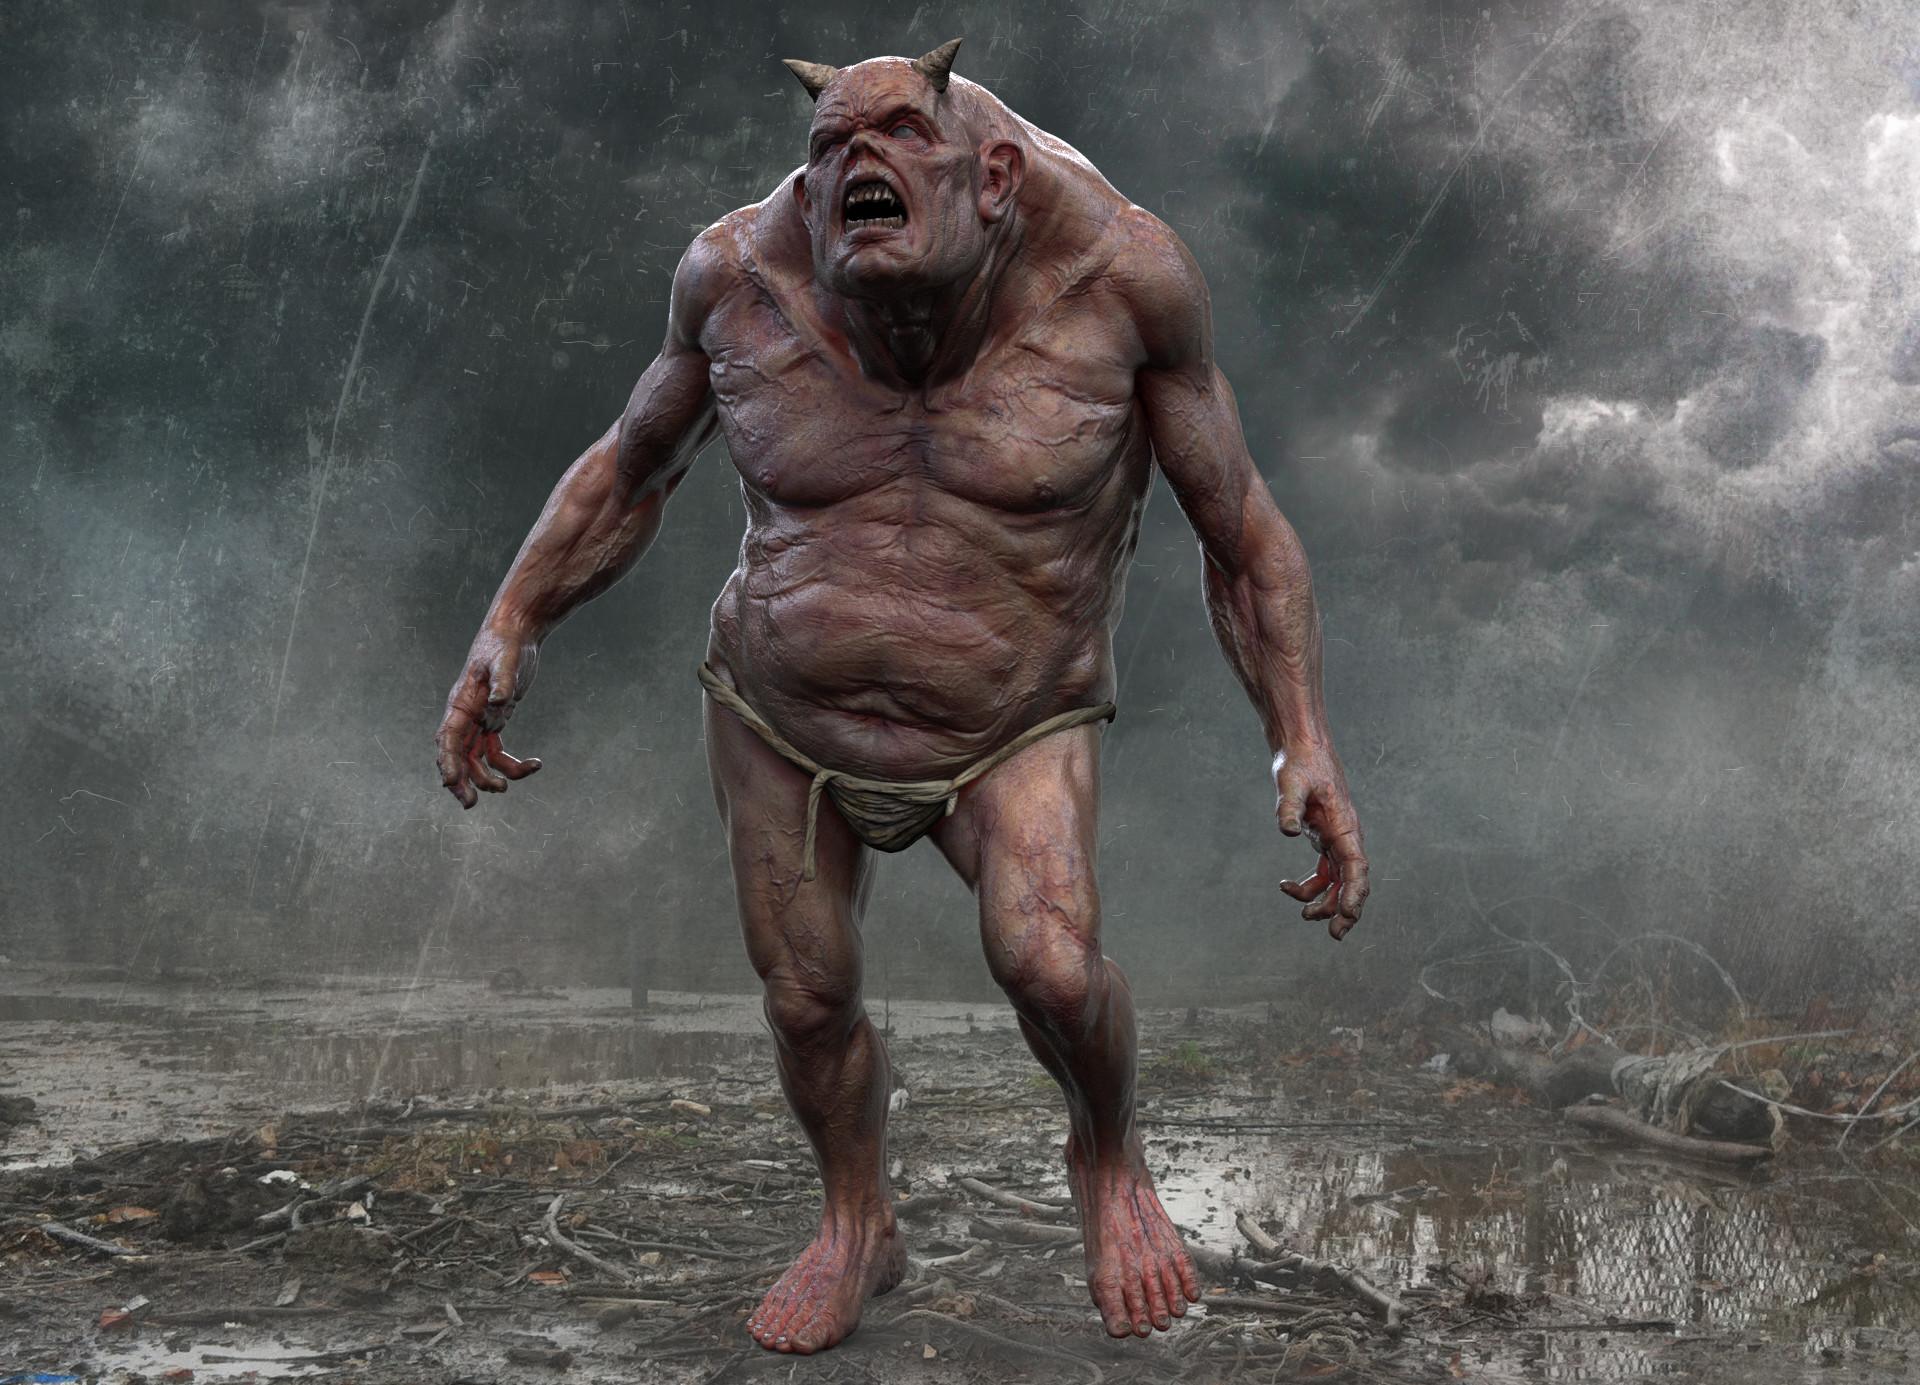 Daniel Midholt Lowland pink dribble trolldivdiv